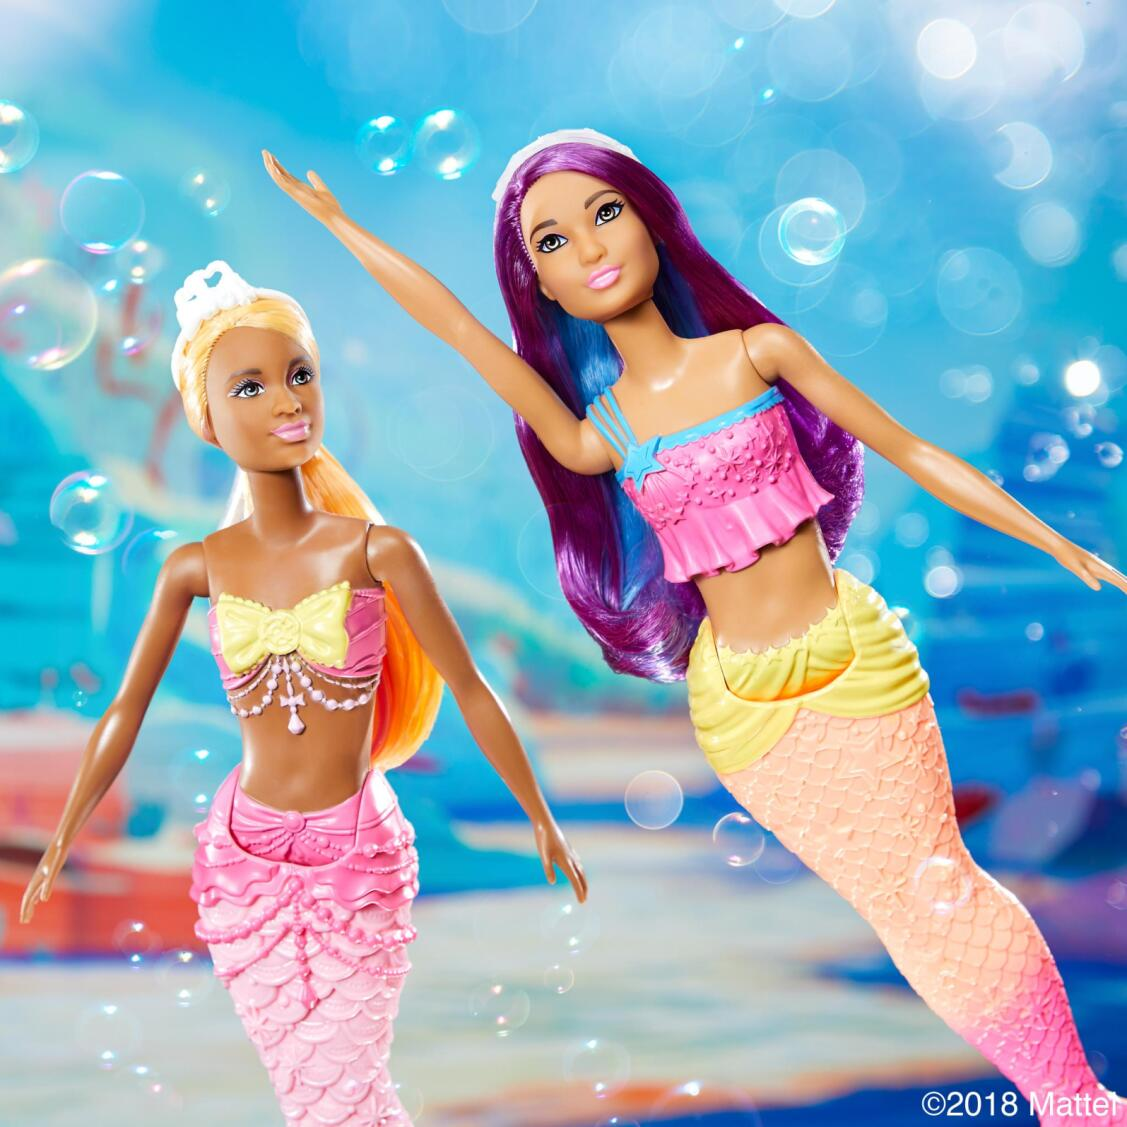 Barbies Mermaids - Original image